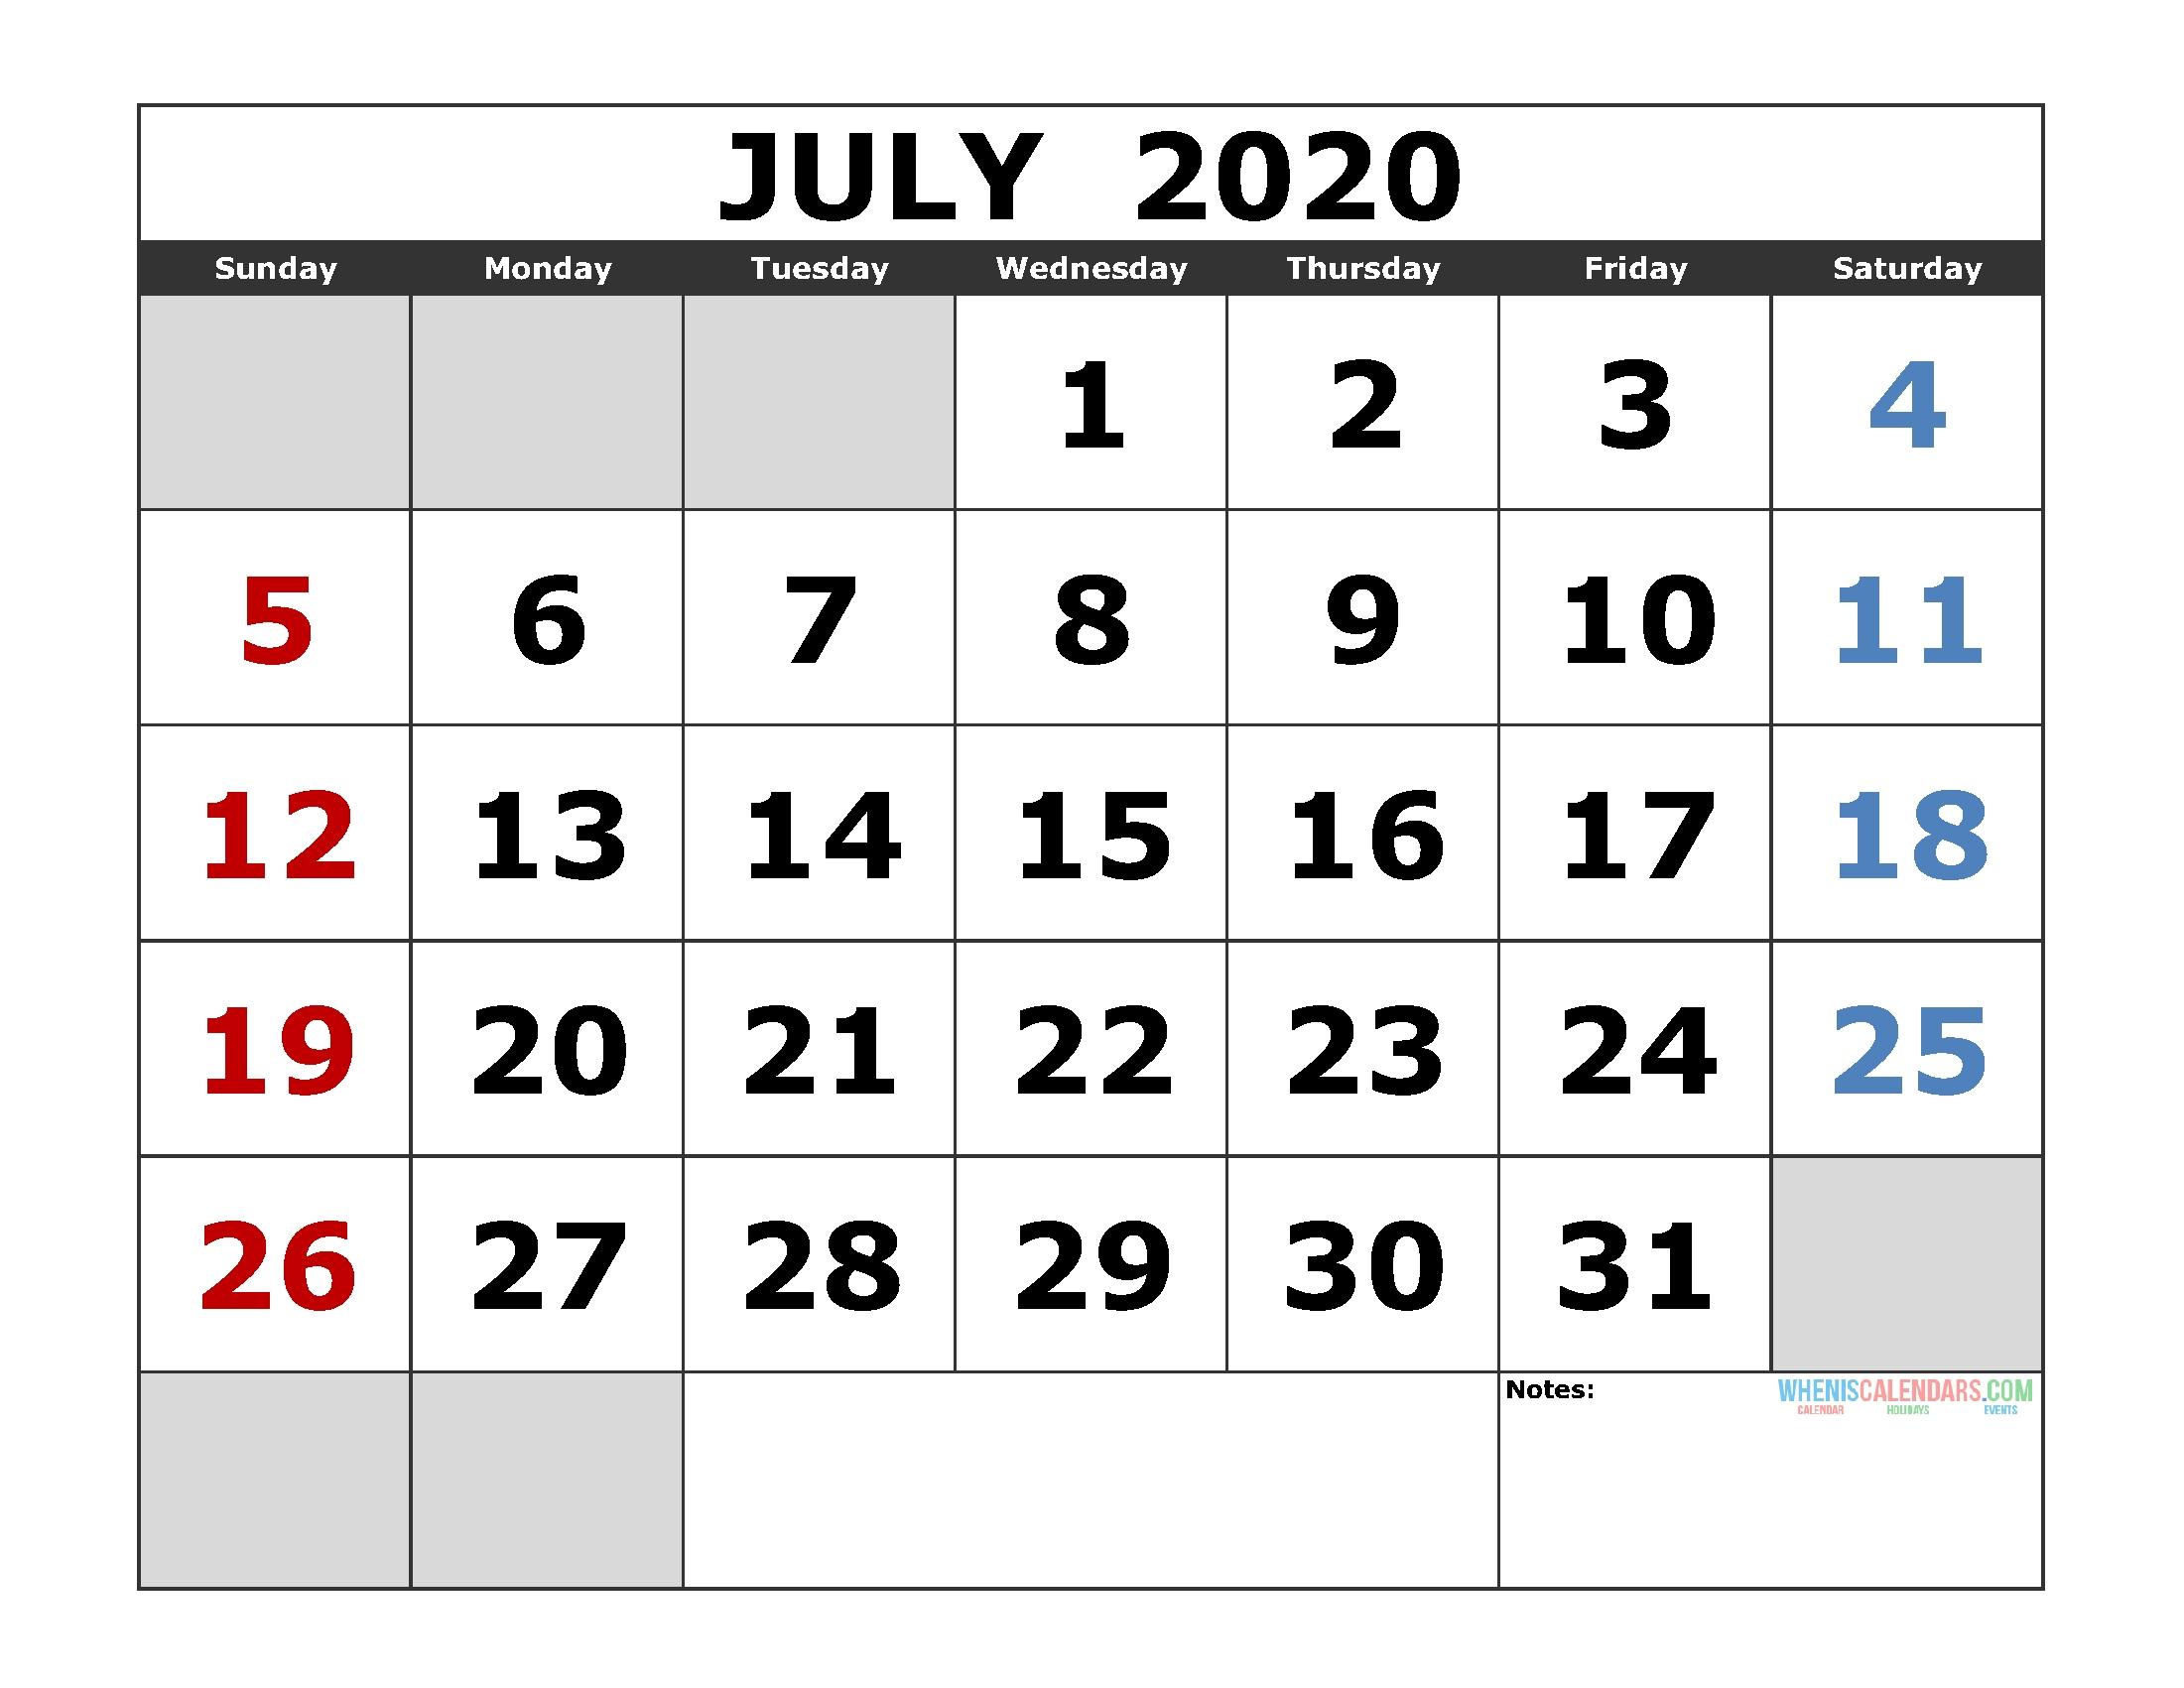 July 2020 Printable Calendar Template Excel, Pdf, Image [Us